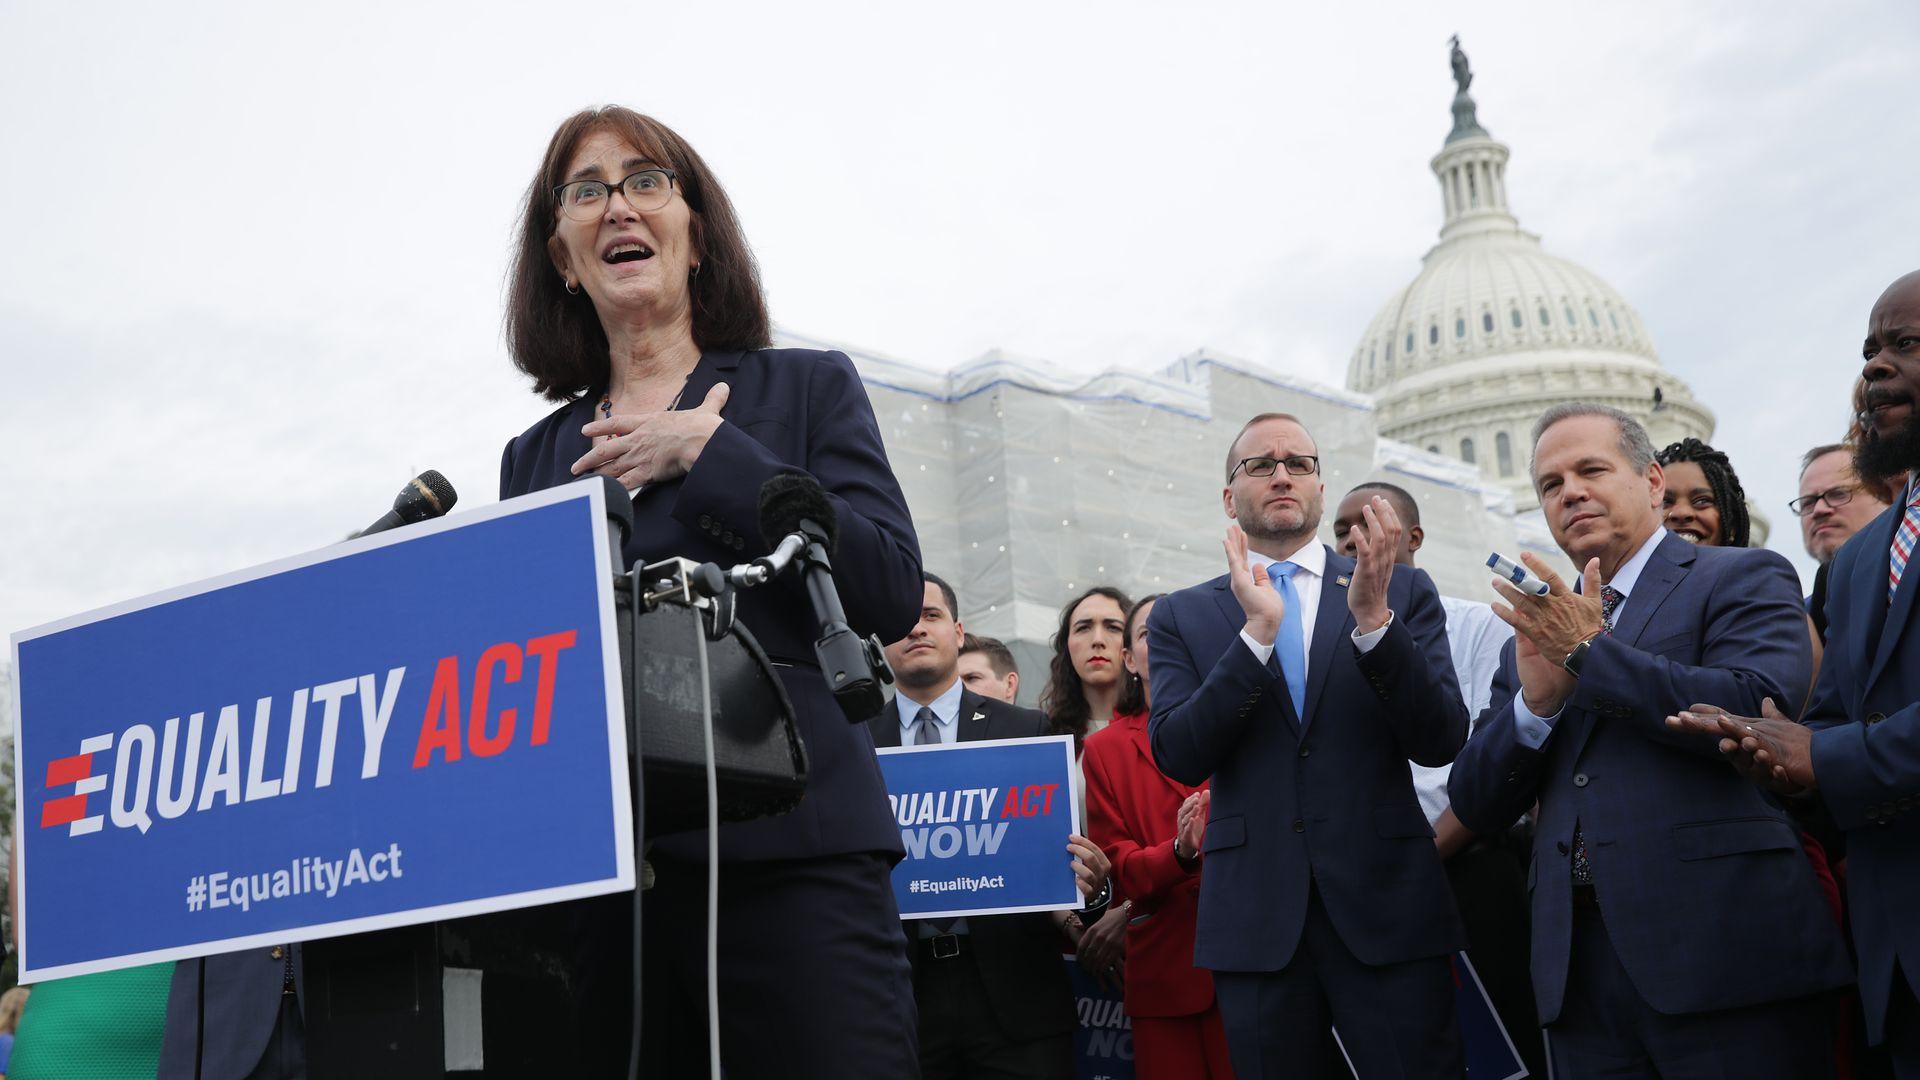 House passes sweeping bill to ban LGBTQ discrimination